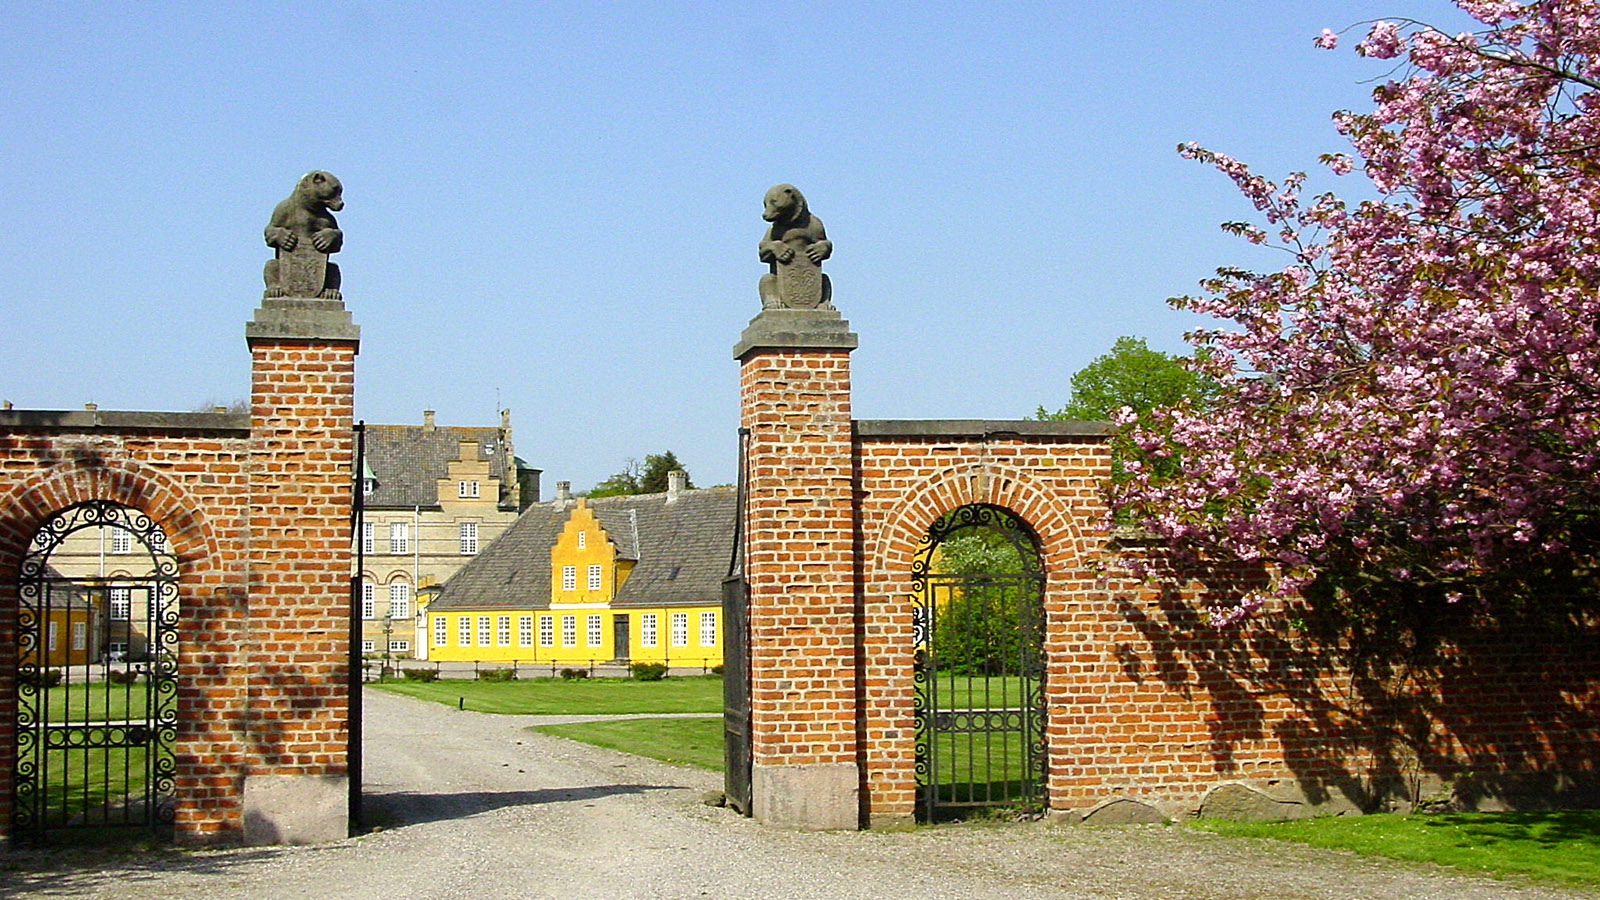 Lolland: Herrenhaus bei Errintlev. Foto: Hilke Maunder